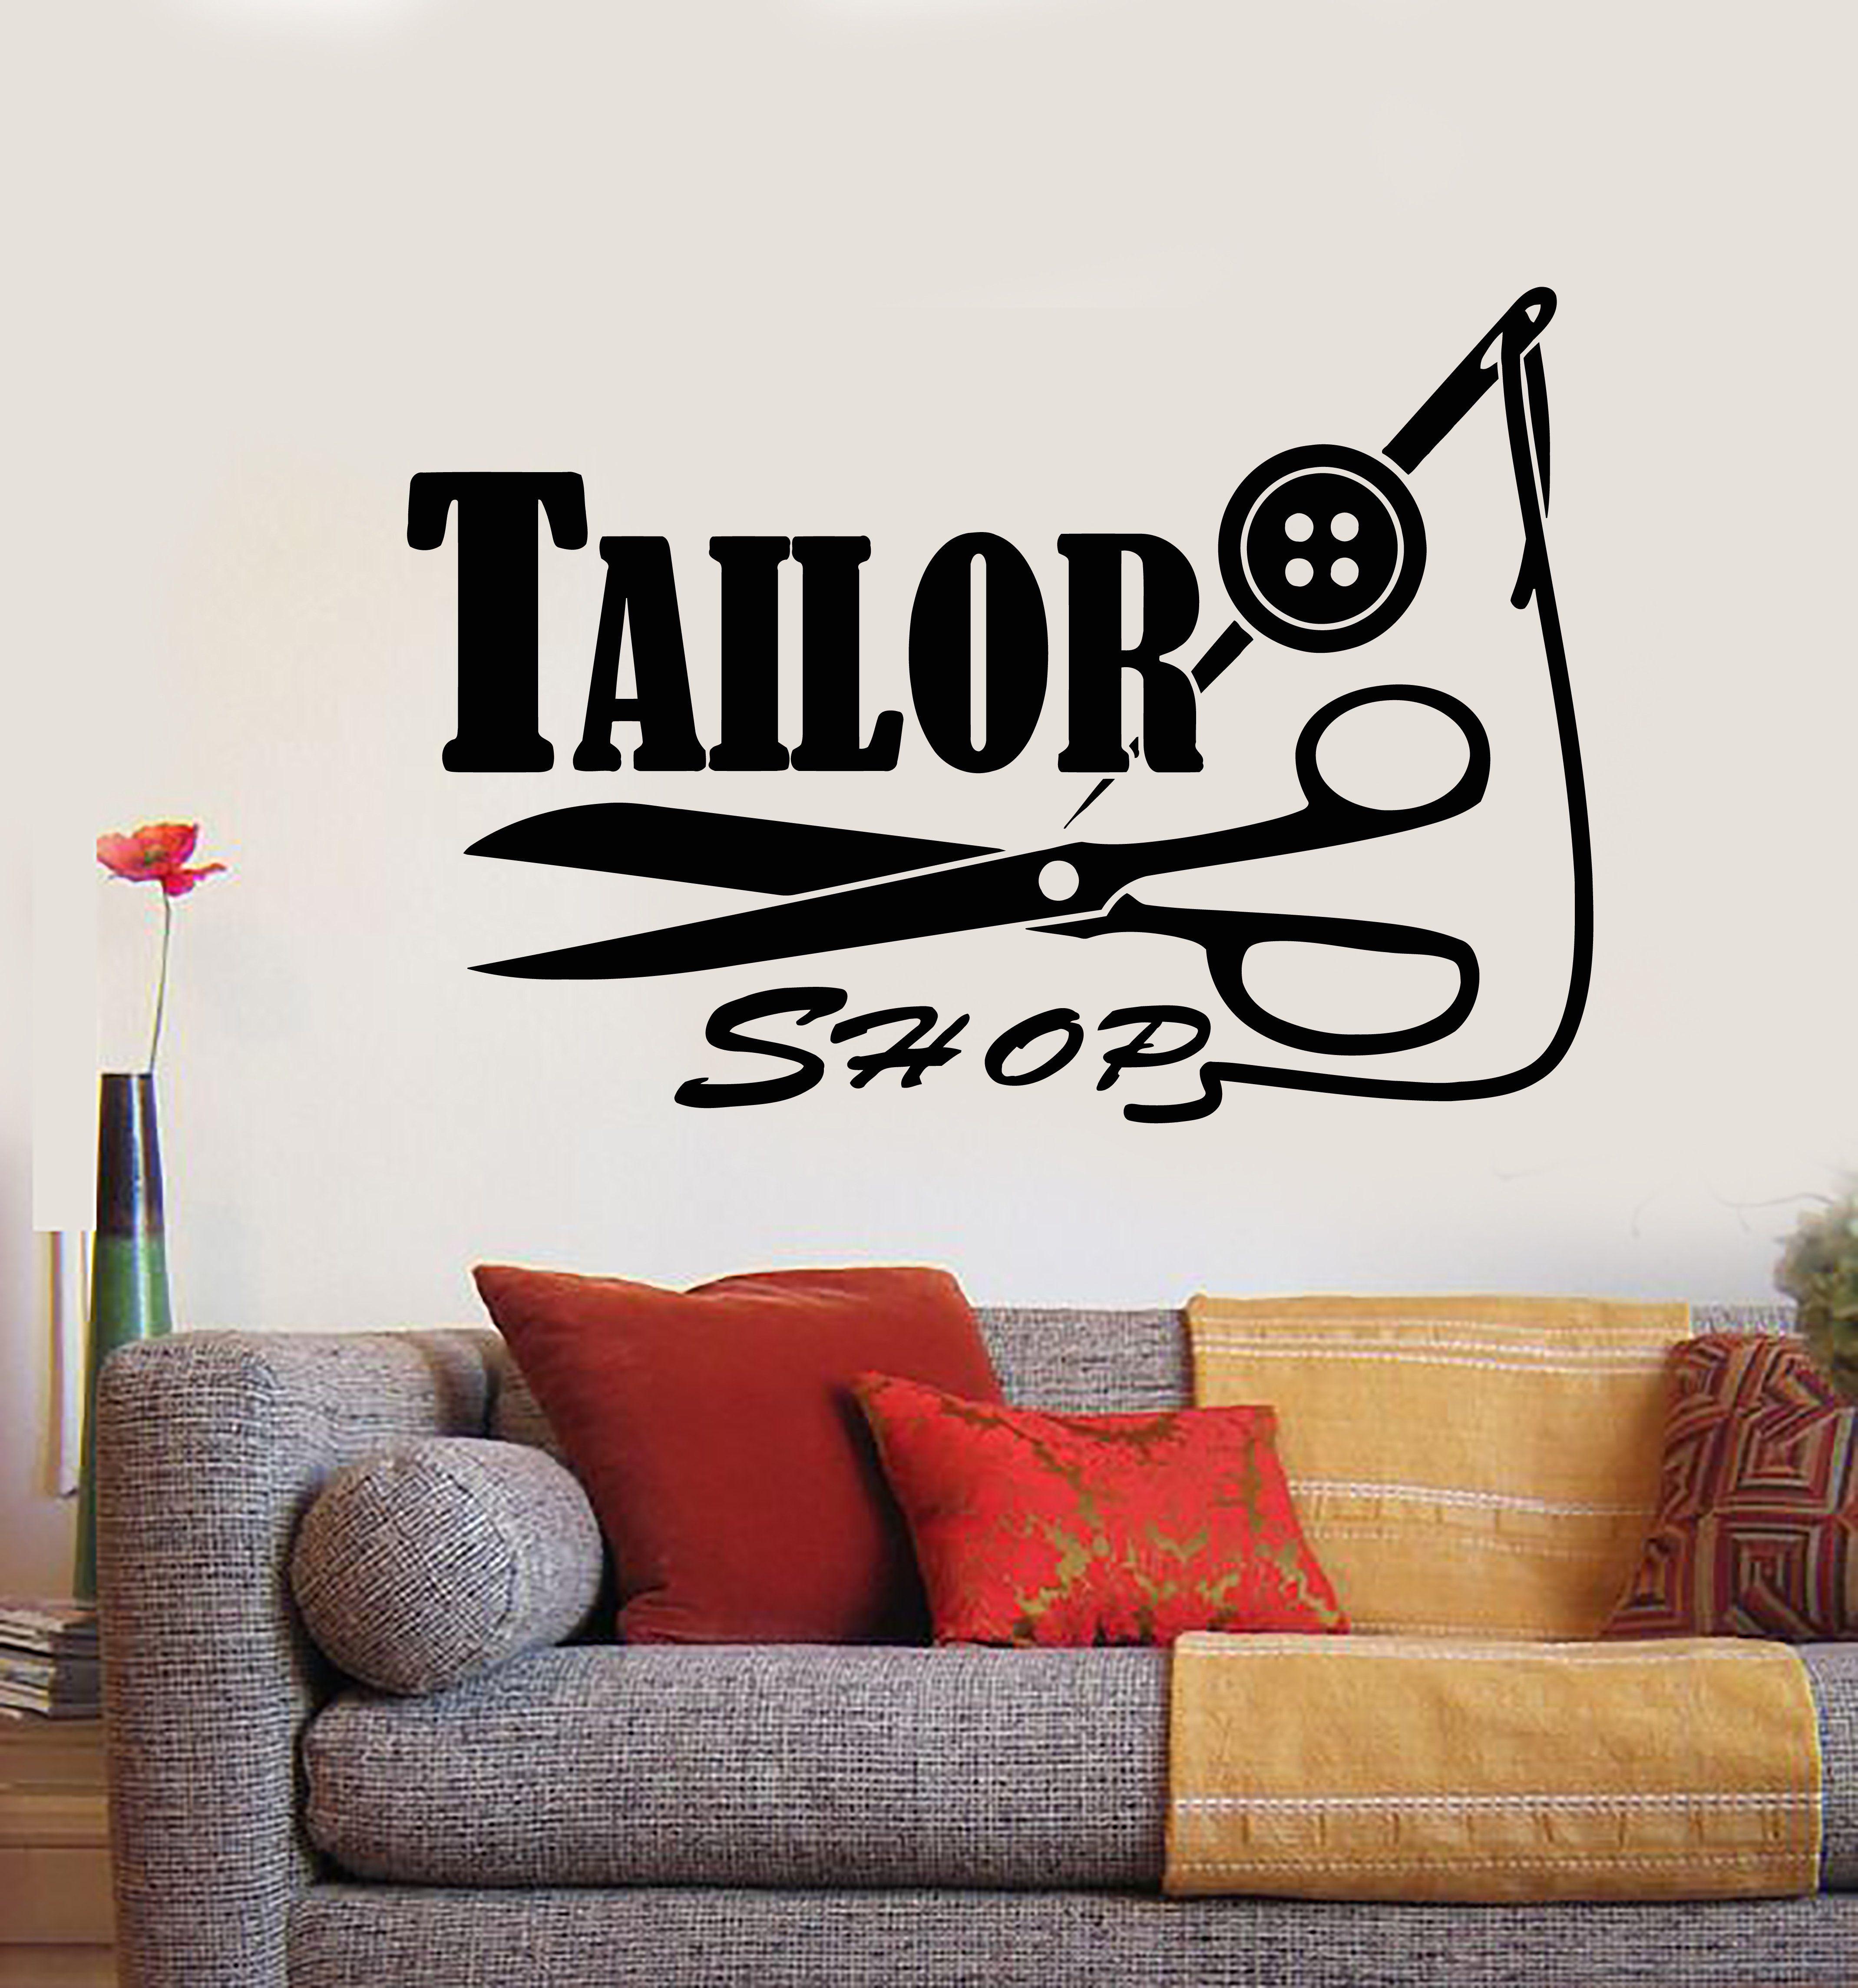 Vinyl Wall Decal Seamstress Tailor Shop Logo Threads